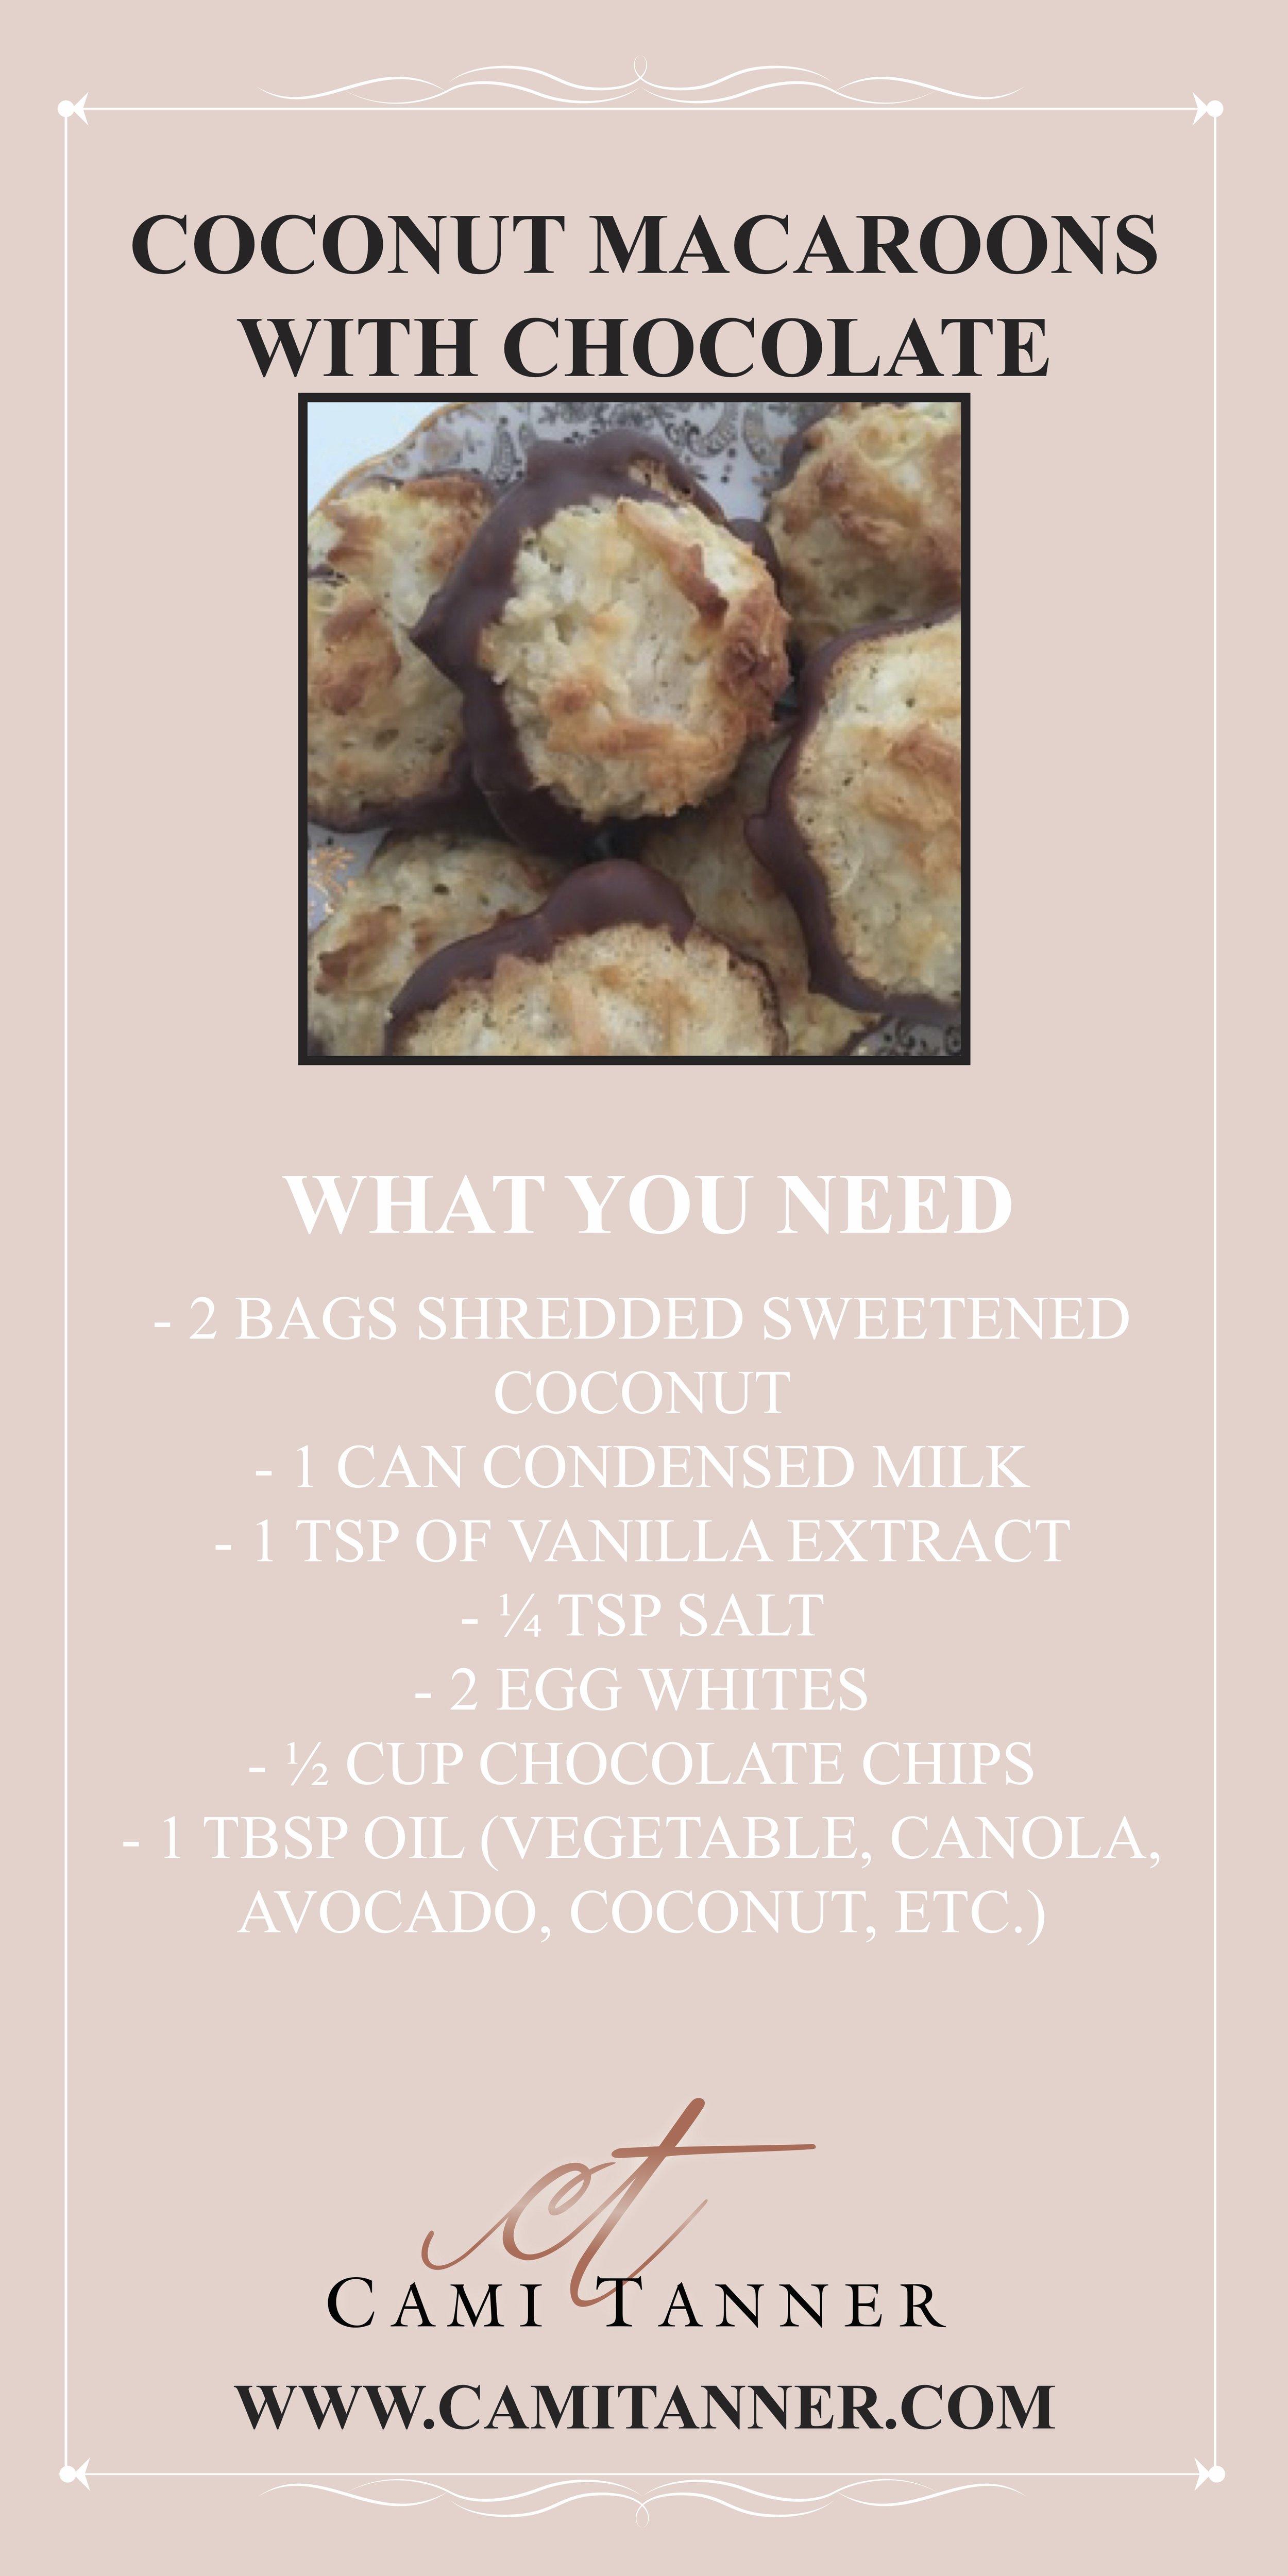 2018-CTB-Supplies-0155-Coconut-Macaroons-with-Chocolate.jpg